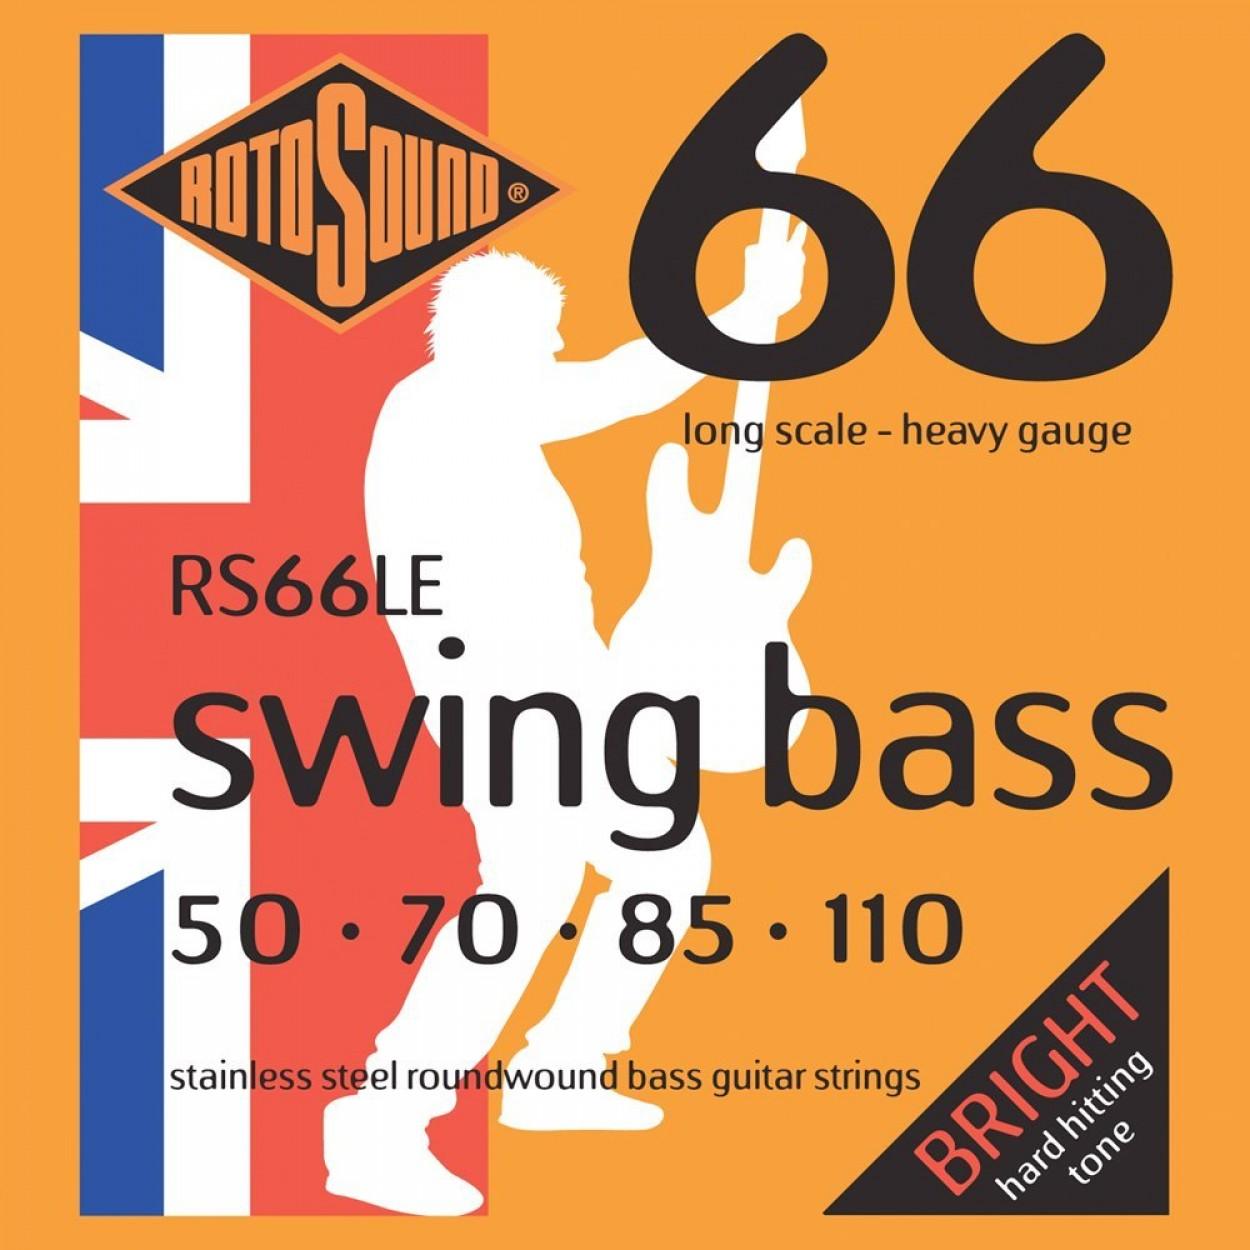 RotoSound 66 Swing Bass Strings 50-110